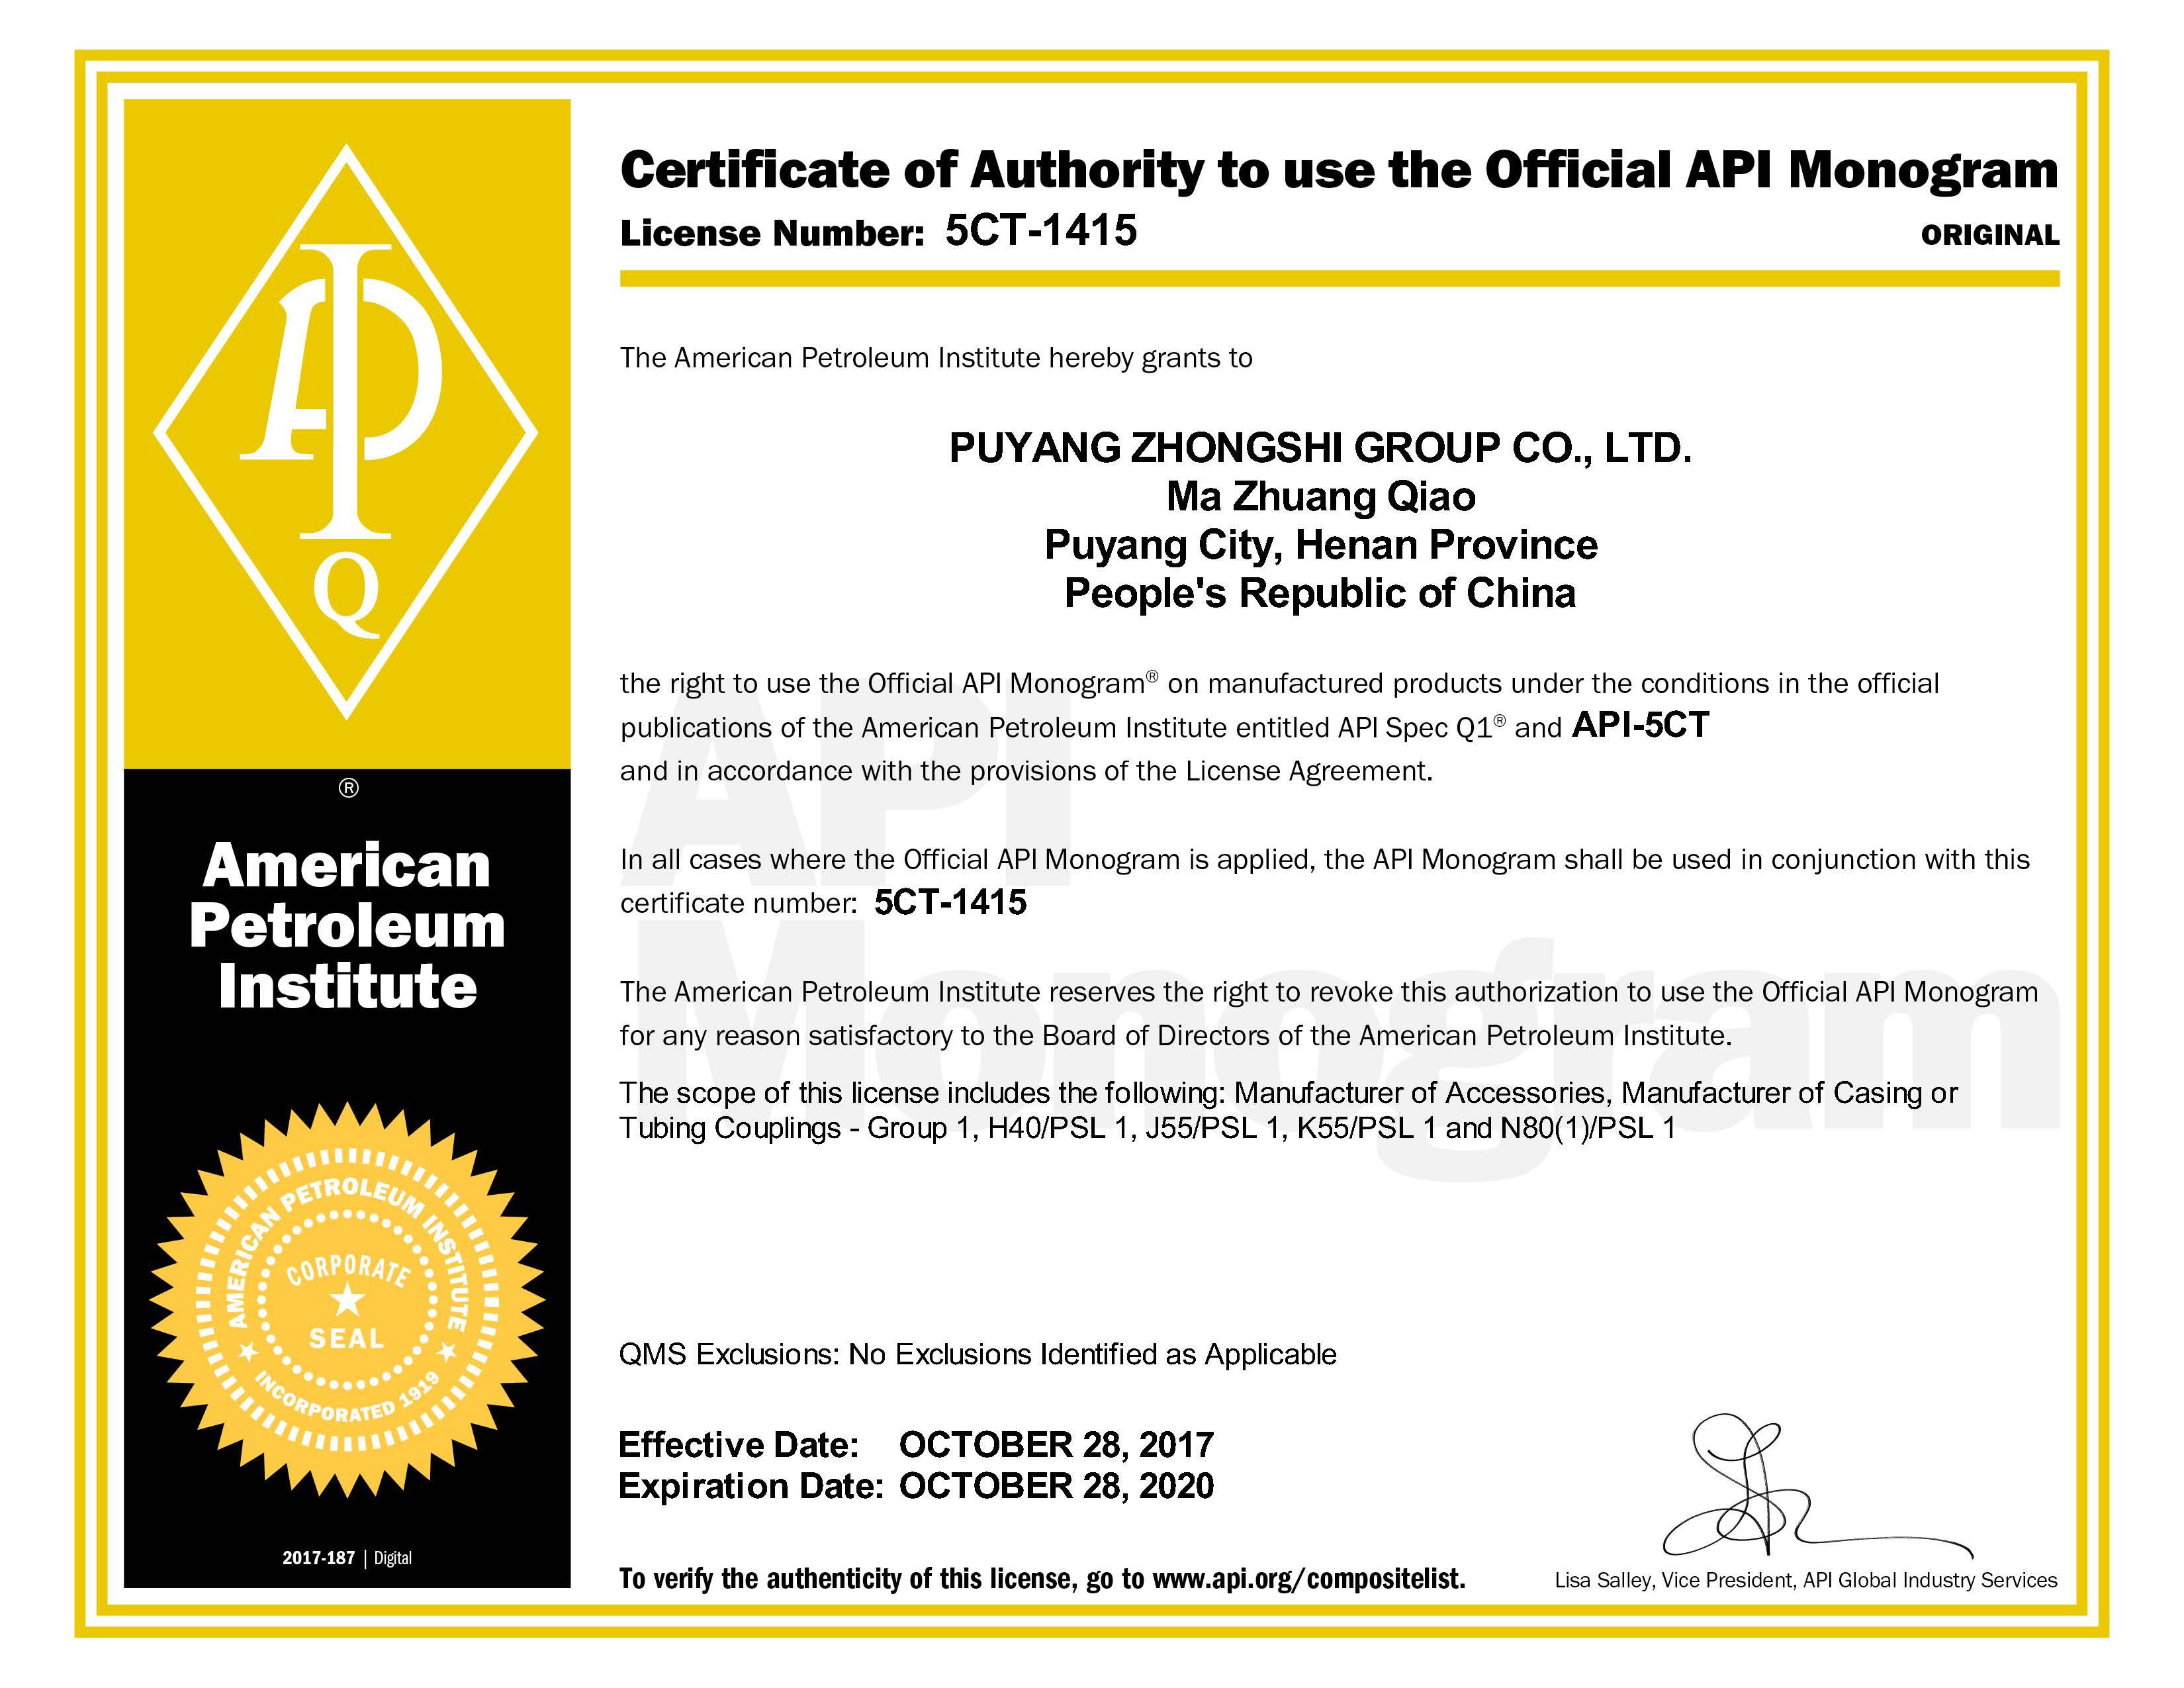 API-5CT-1415